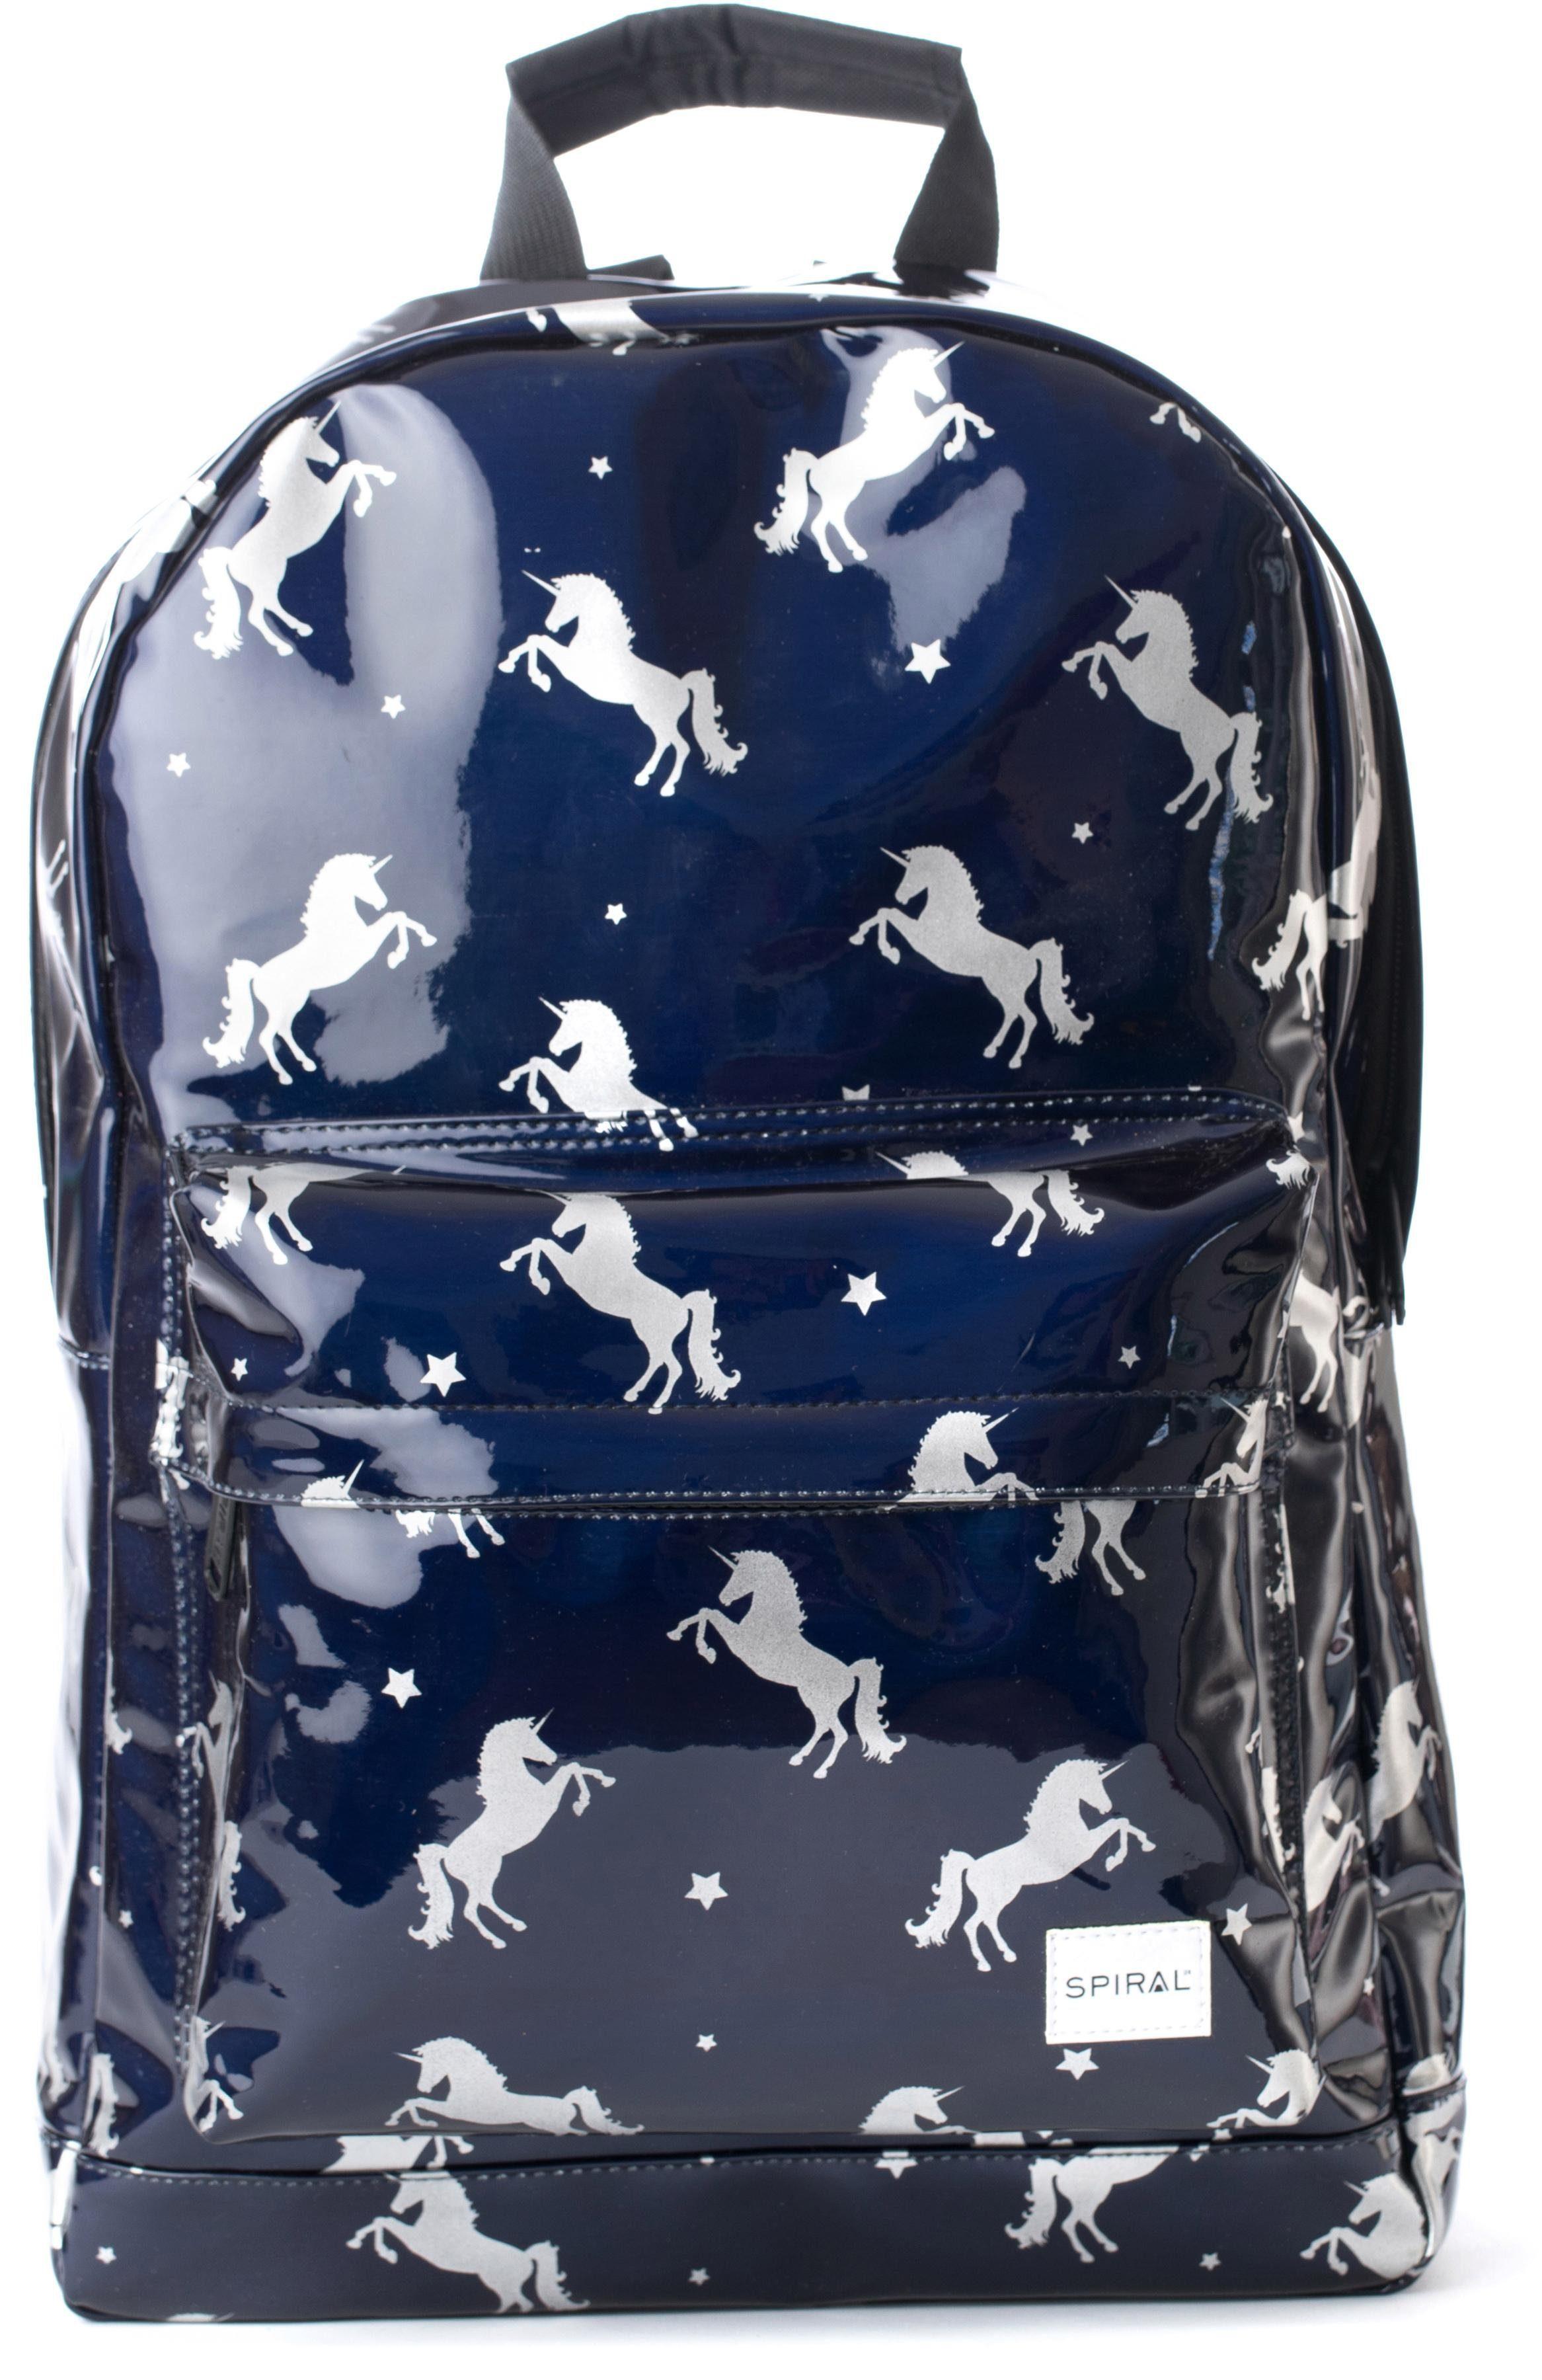 Spiral® Rucksack mit Laptopfach, »OG Platin, Black Unicorns«